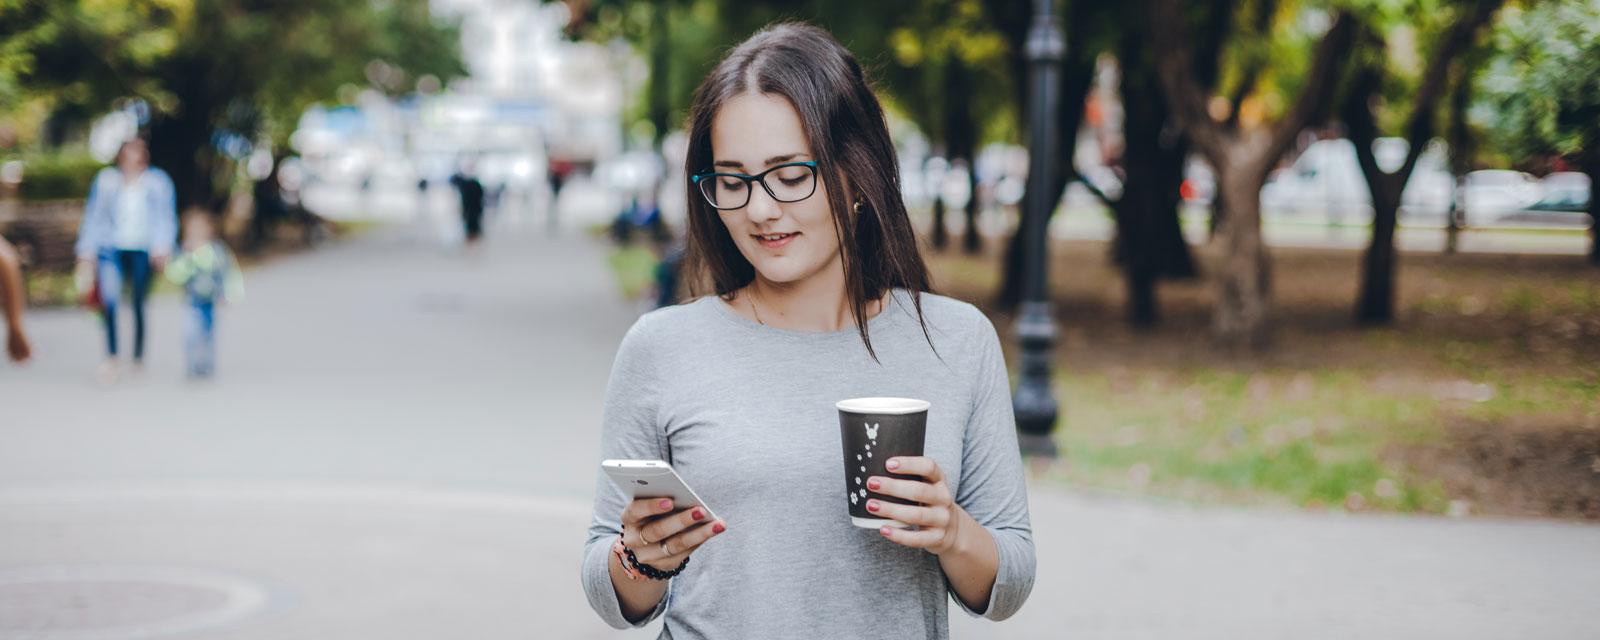 campañas creativas sms